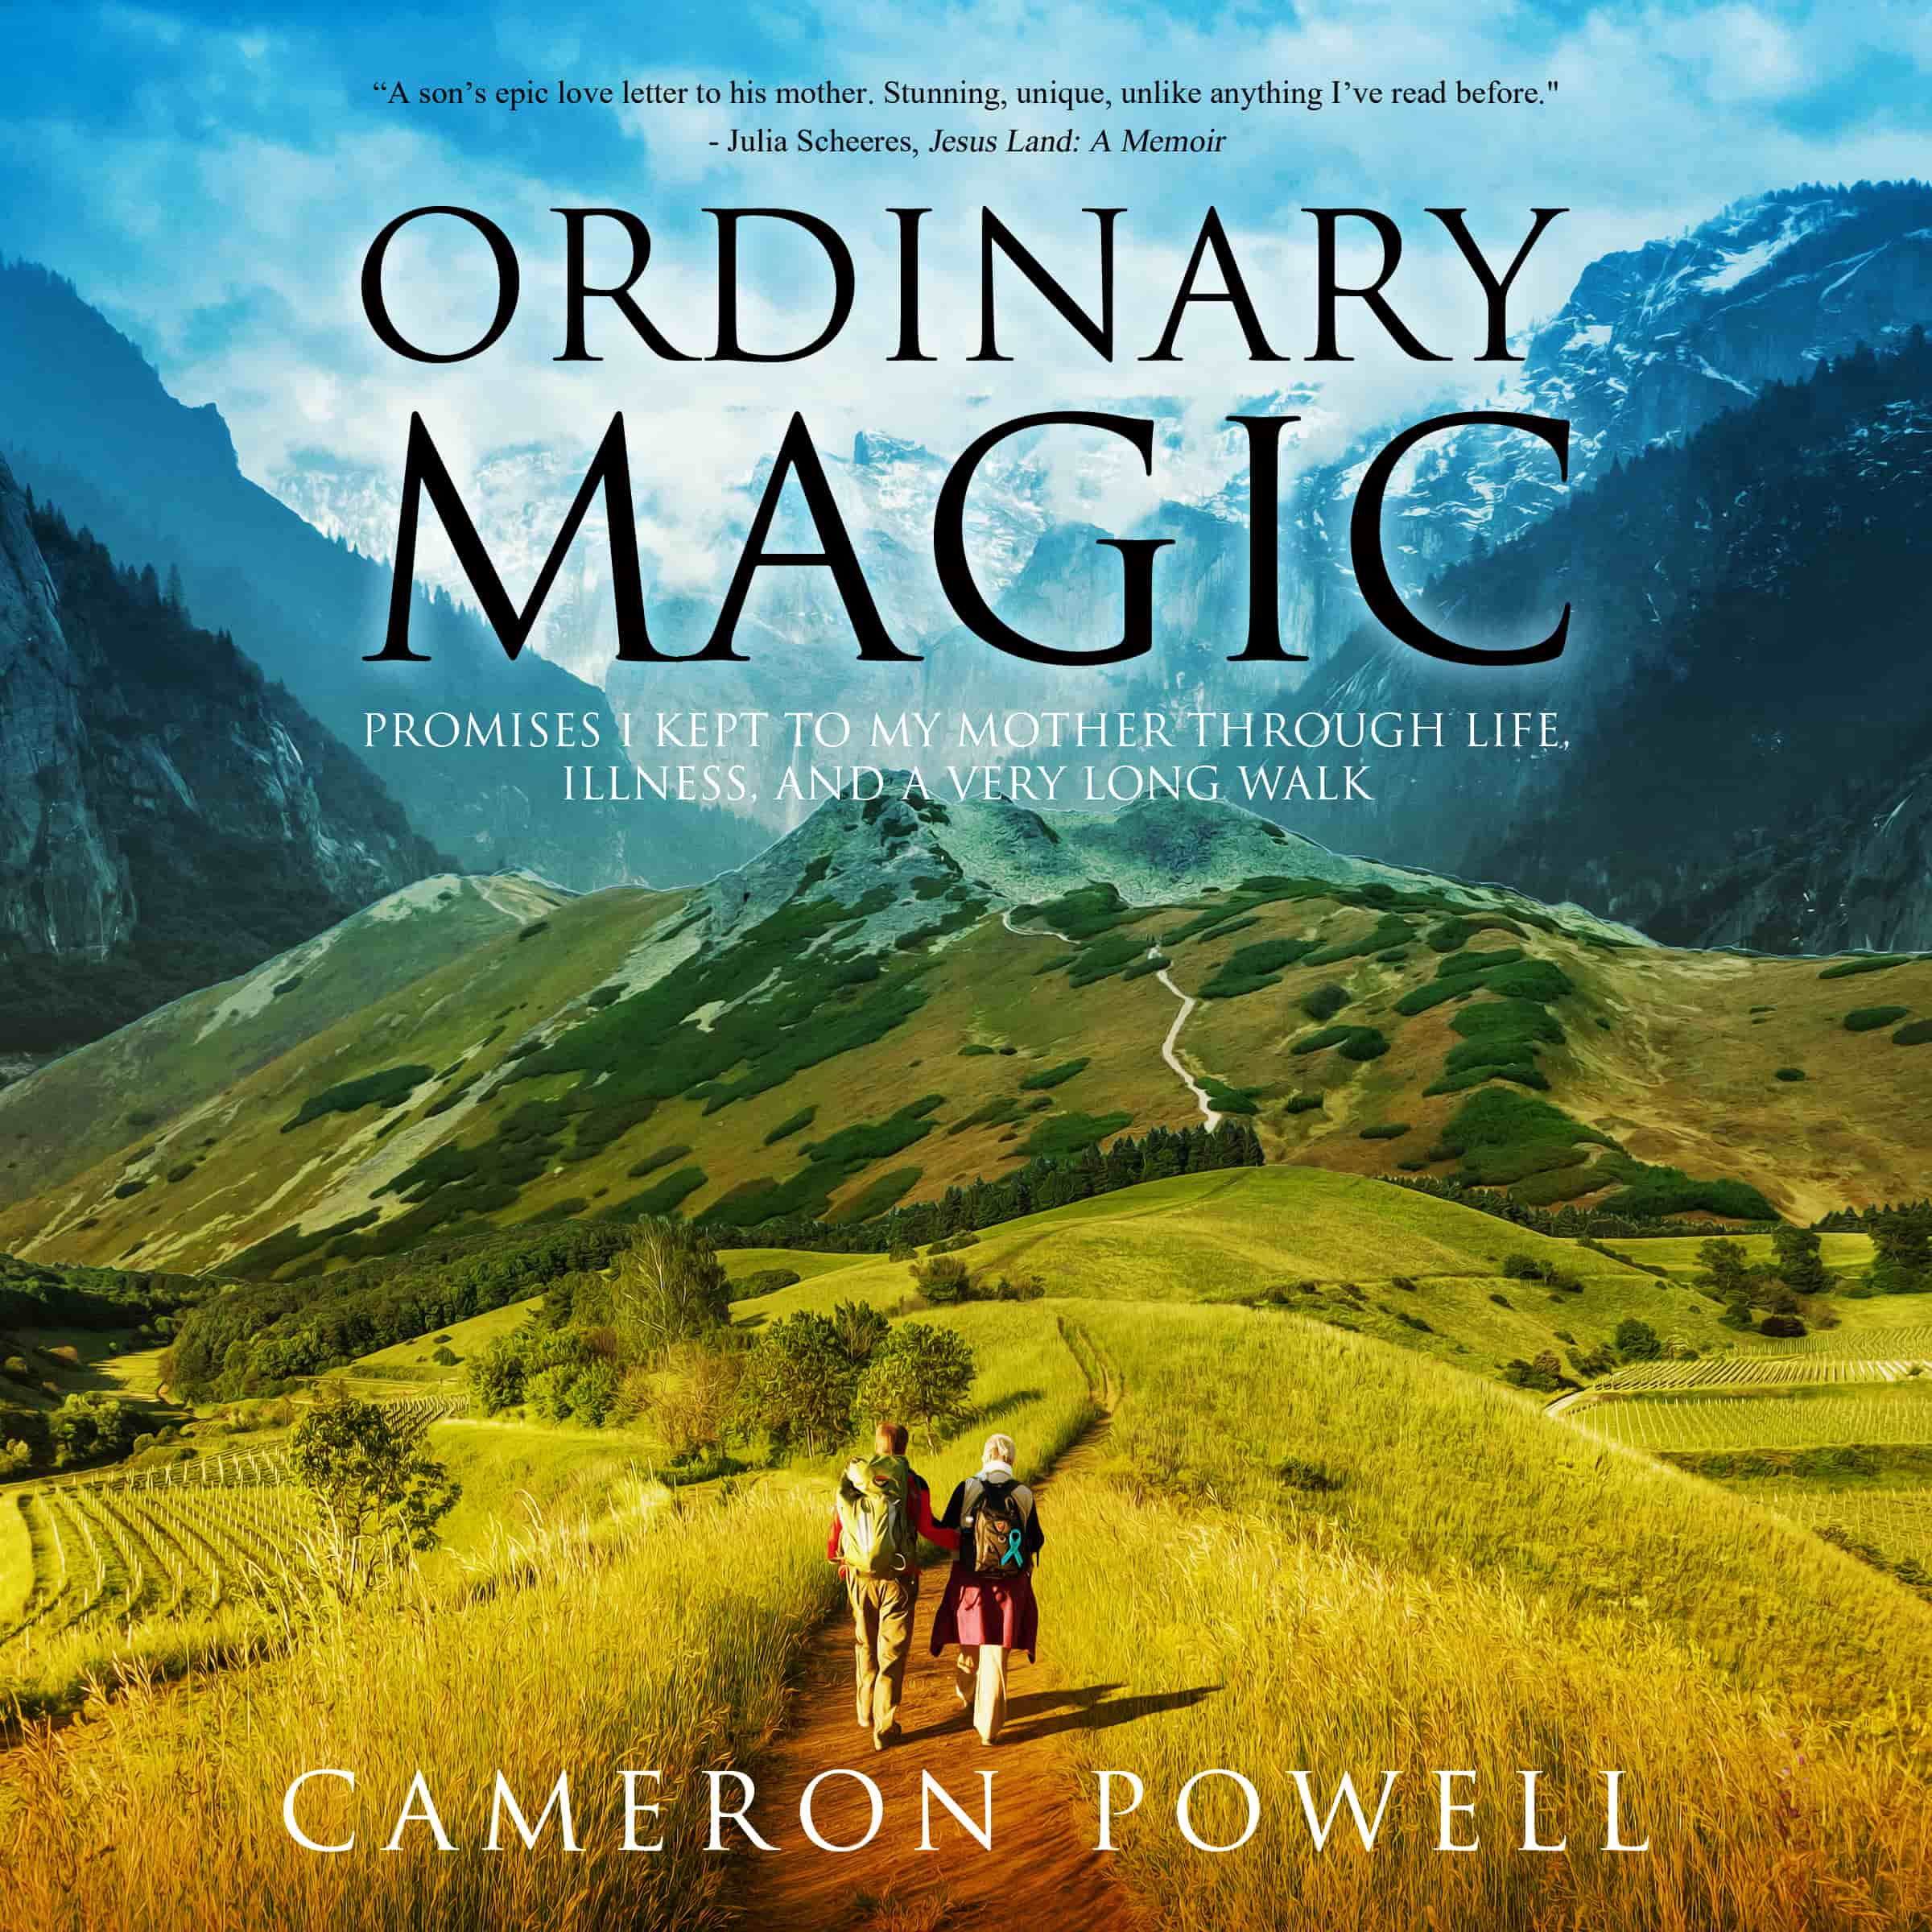 Ordinary Magic book cover